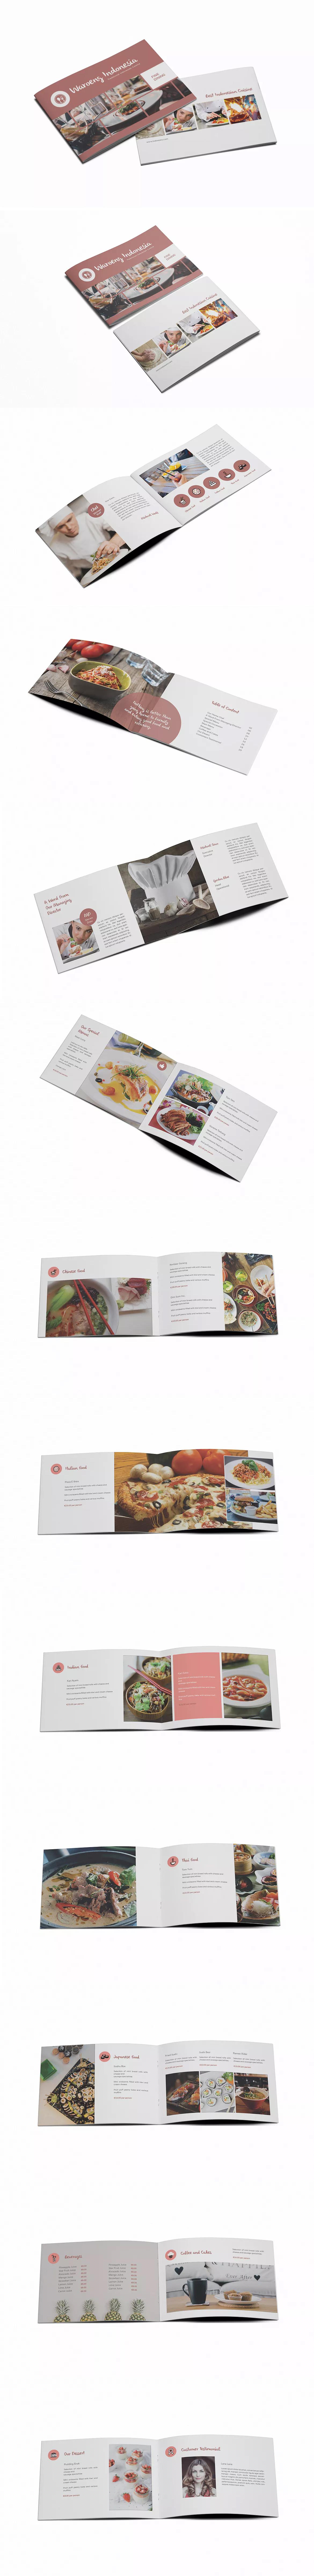 Restaurant Brochure Template InDesign INDD A5 | Brochure Templates ...